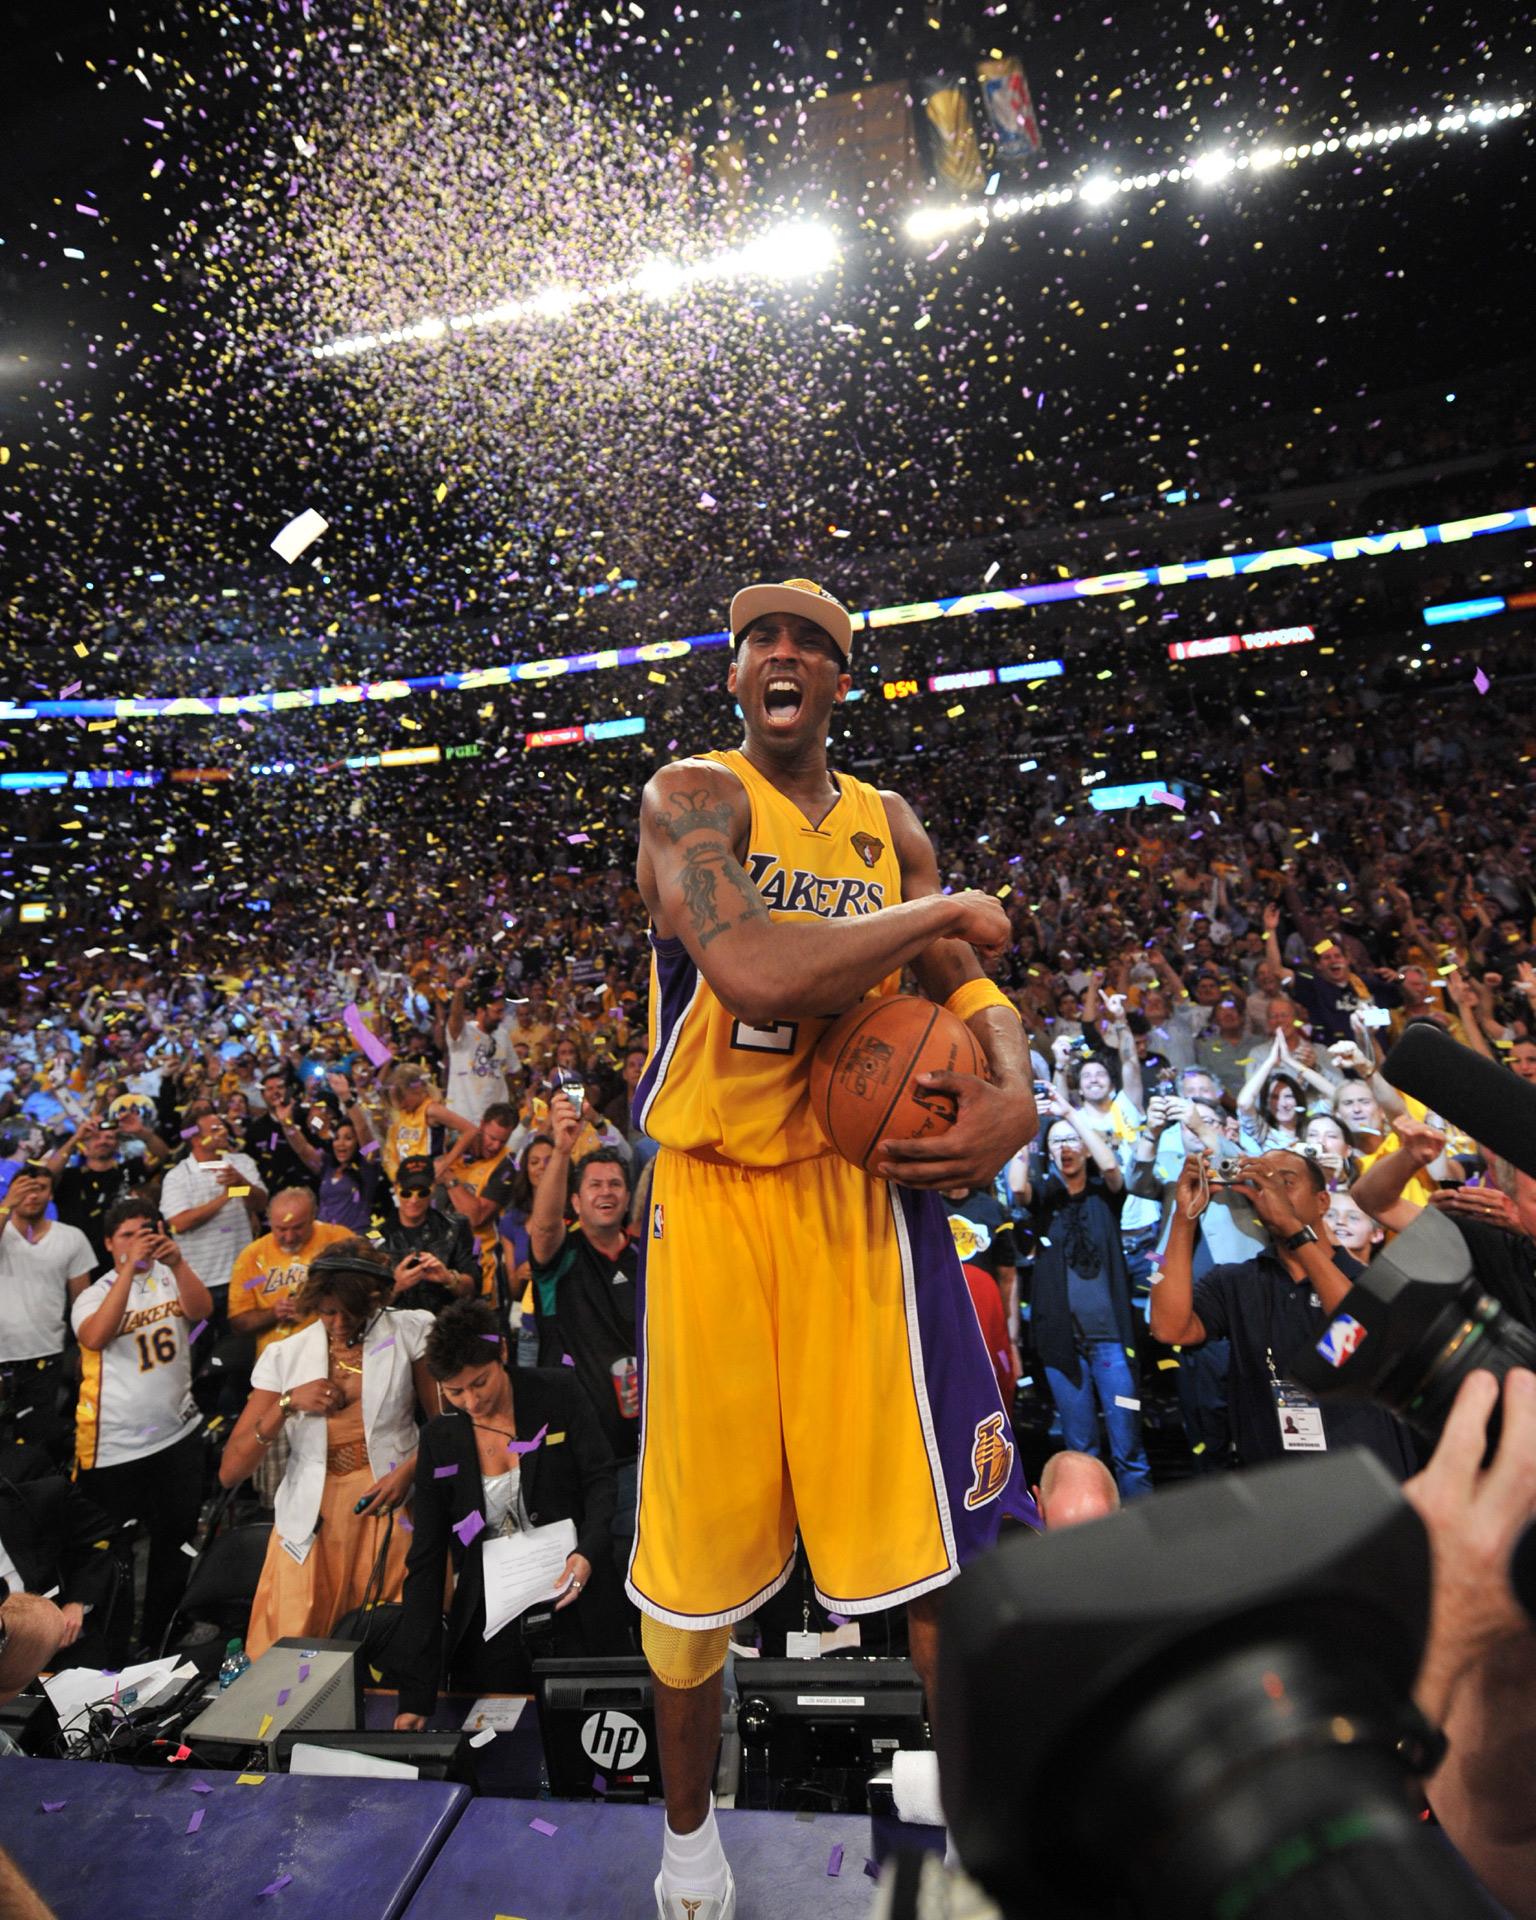 Kobe Bryant - Kobe Bryant's Life in Photos - ESPN